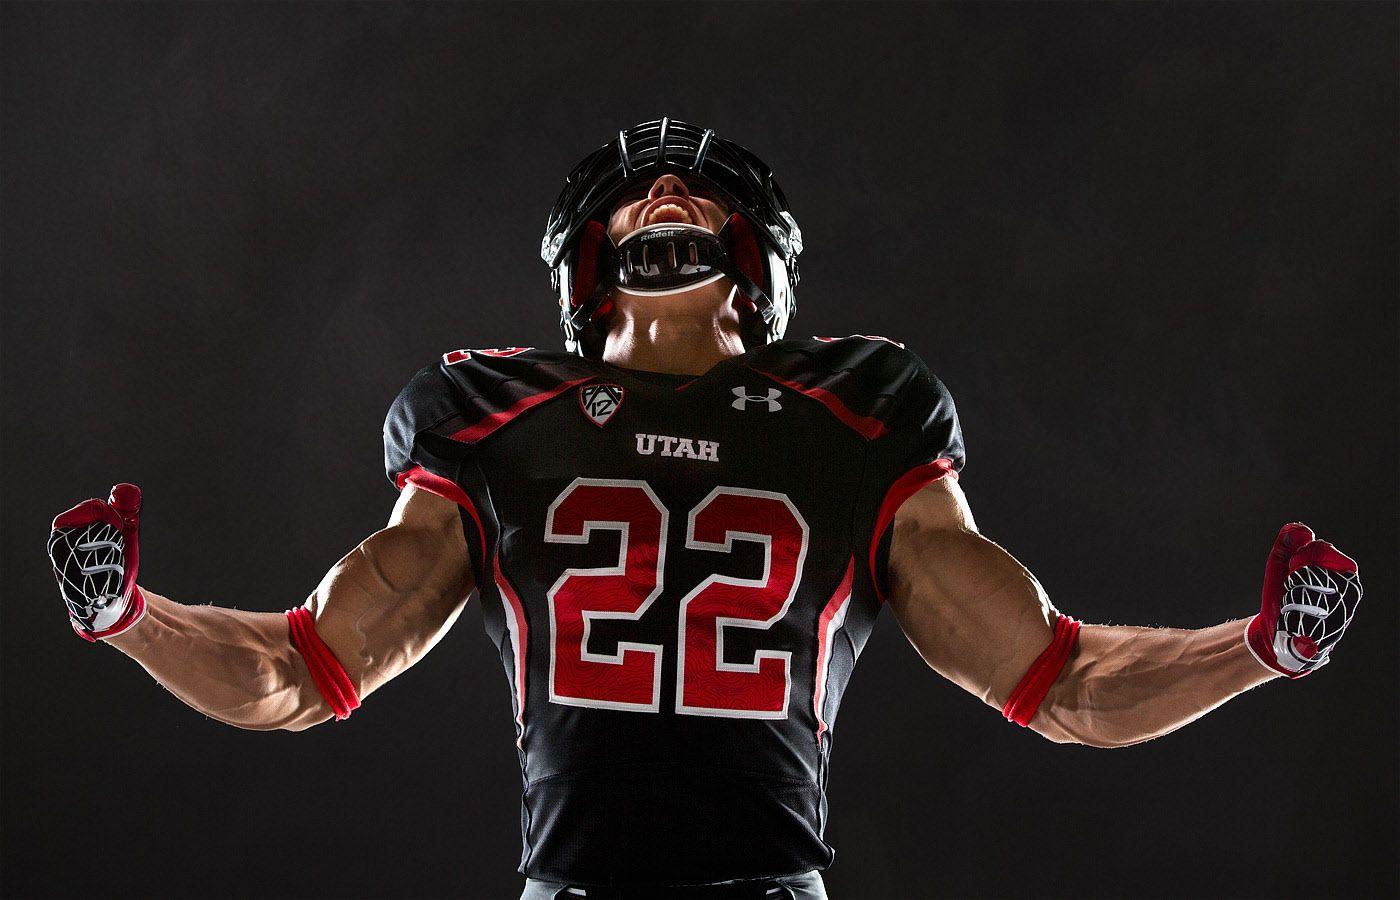 University Of Utah Football Hall Of Fame Photography On Behance In 2020 Utah Football Football Photography University Of Utah Football